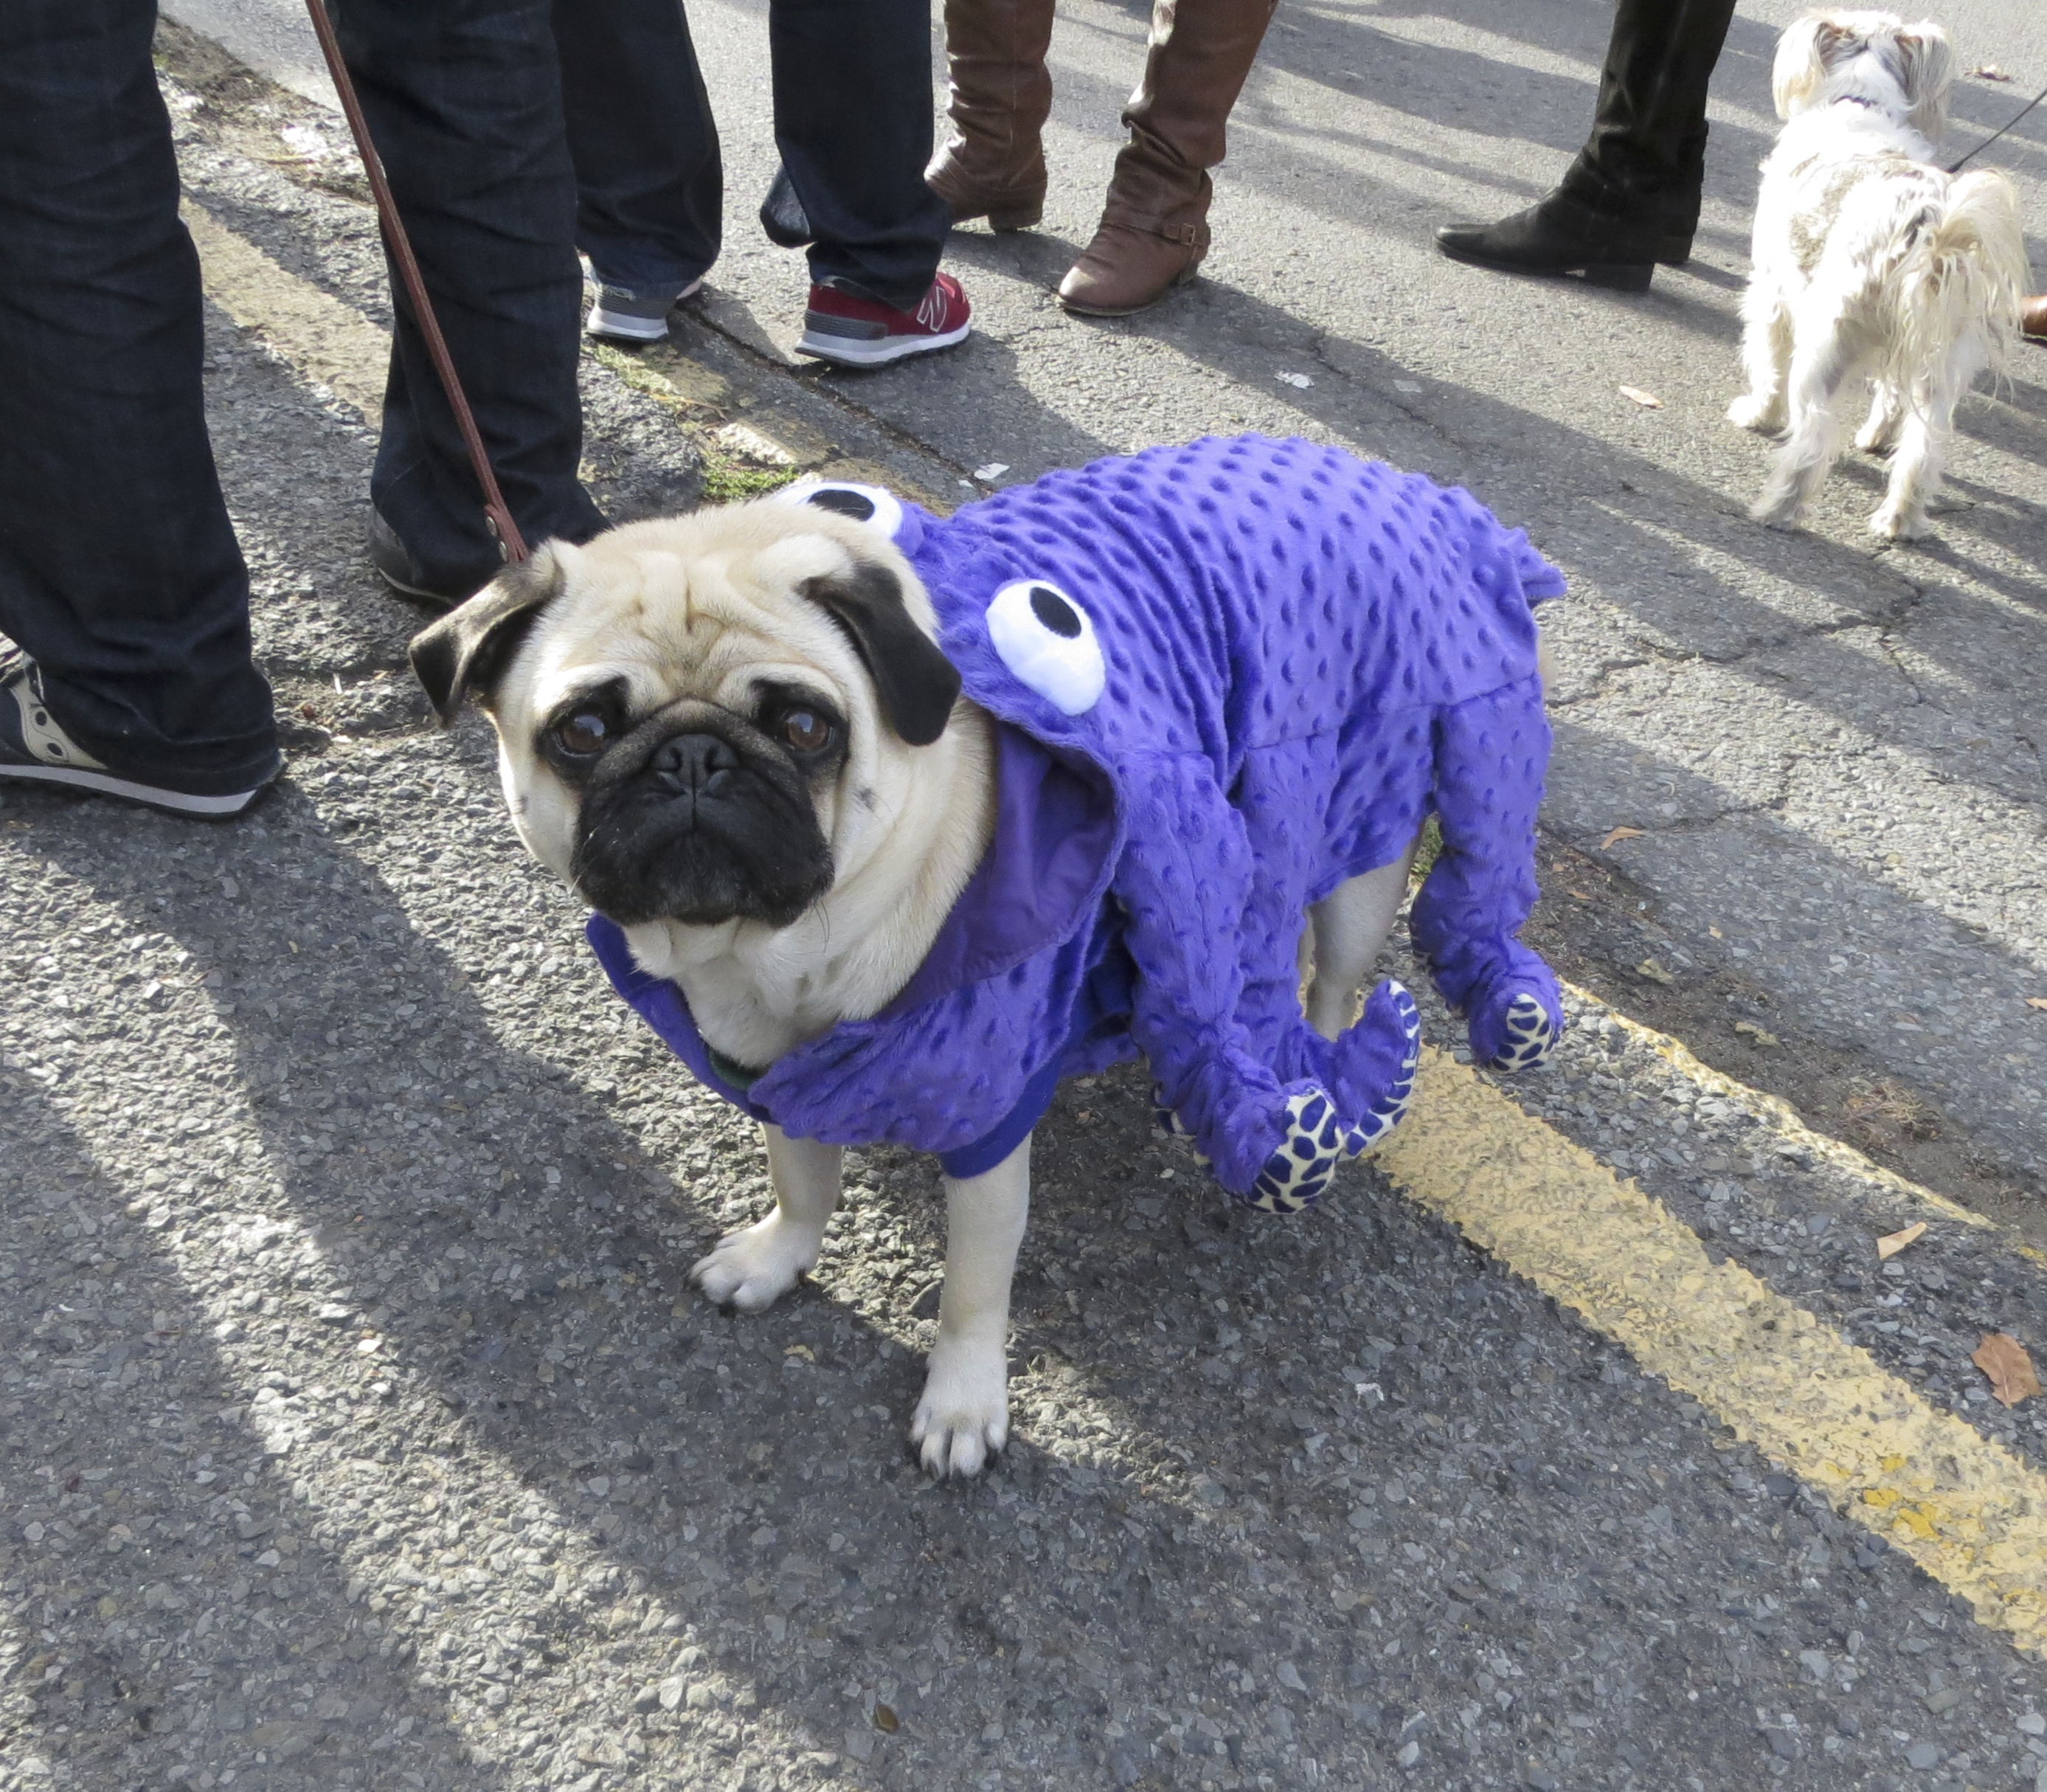 A Pug in a Purple Octopus Costume